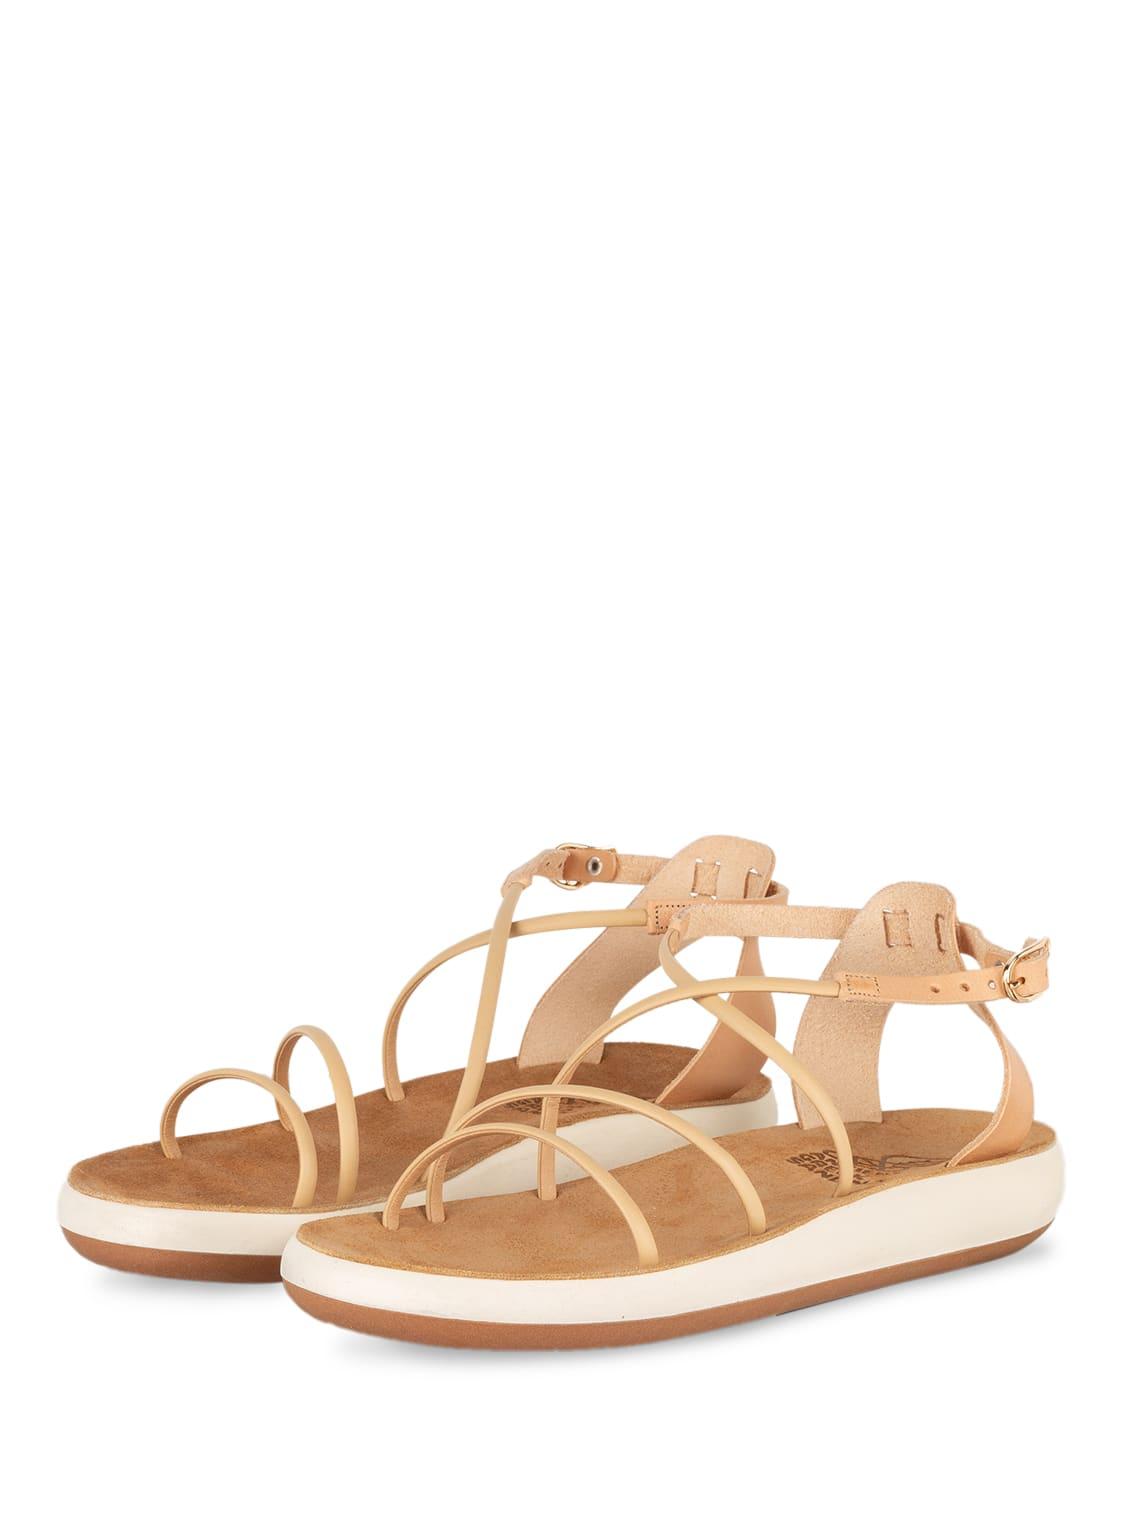 Image of Ancient Greek Sandals Sandalen Anastasia Comfort braun